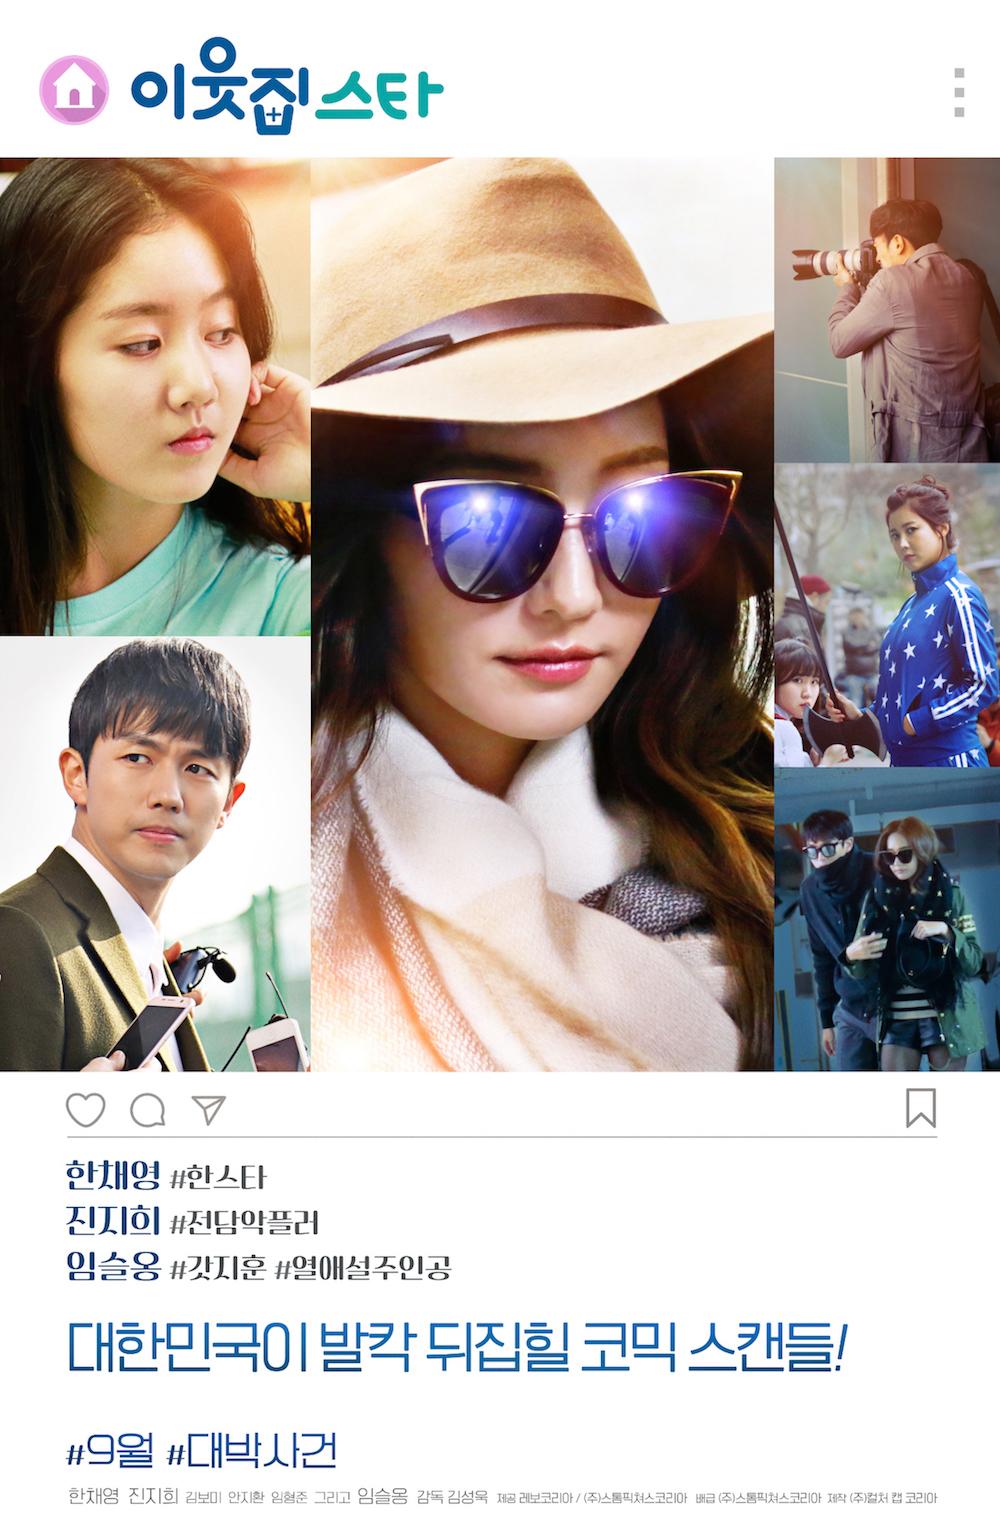 Sinopsis Star Nextdoor / Iwootjib Seuta / 이웃집 스타 (2017) - Film Korea